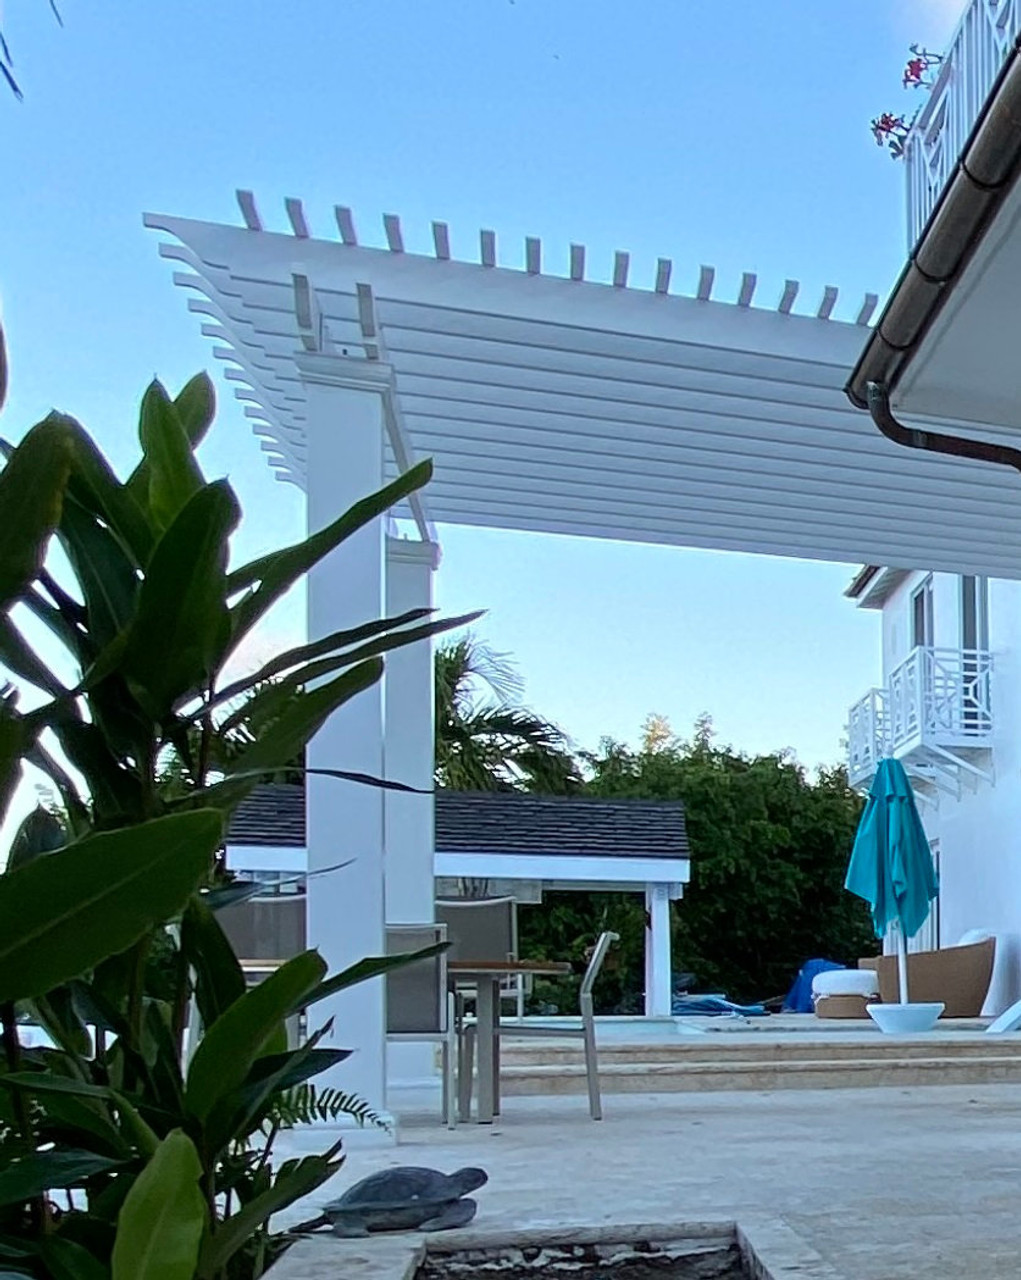 14x16 Wall Mounted Structural Fiberglass Pergola Kit, Jacksonville, FL